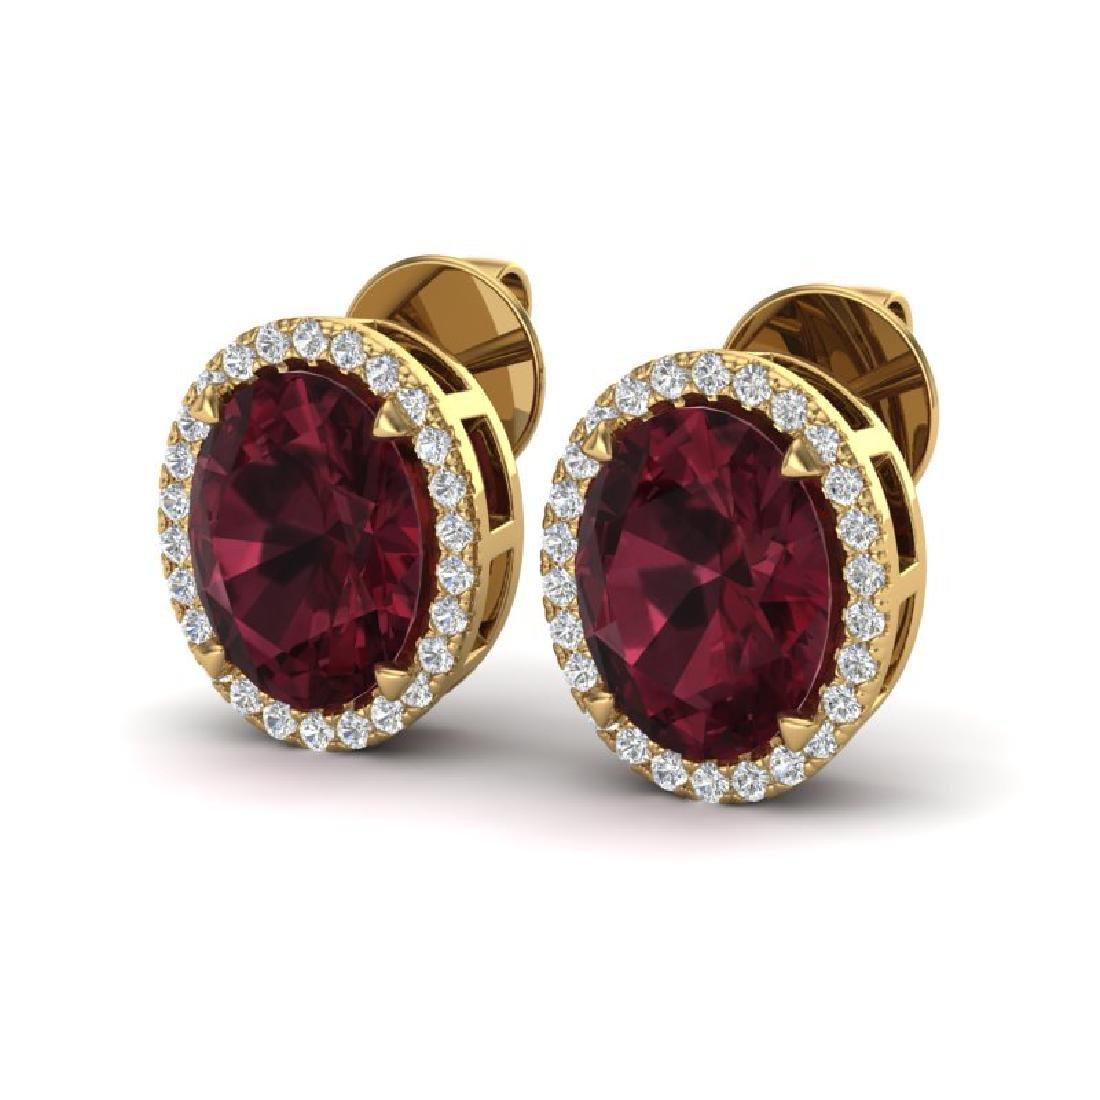 5.50 CTW Garnet & Micro VS/SI Diamond Halo Earrings 18K